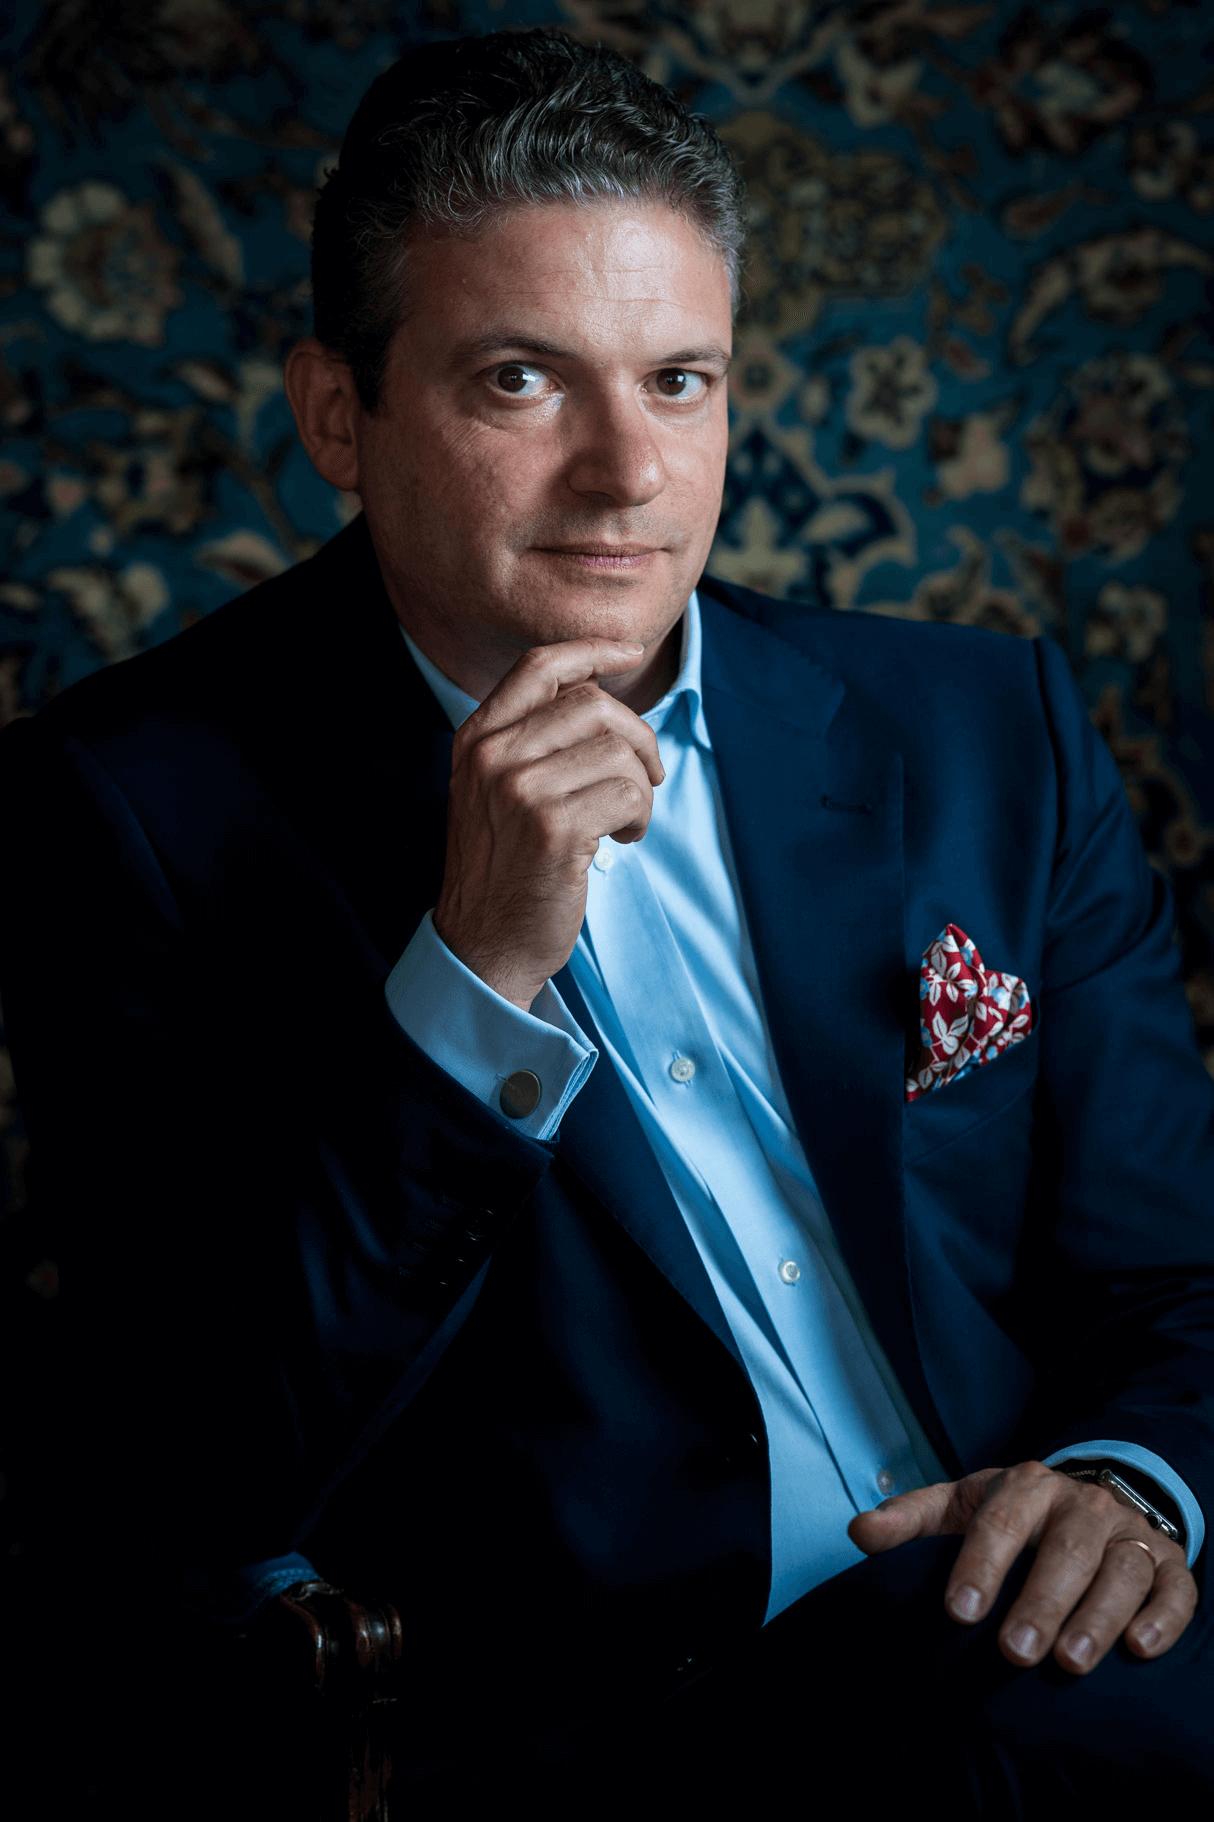 Robert Aronson, The Delft Blue Detective